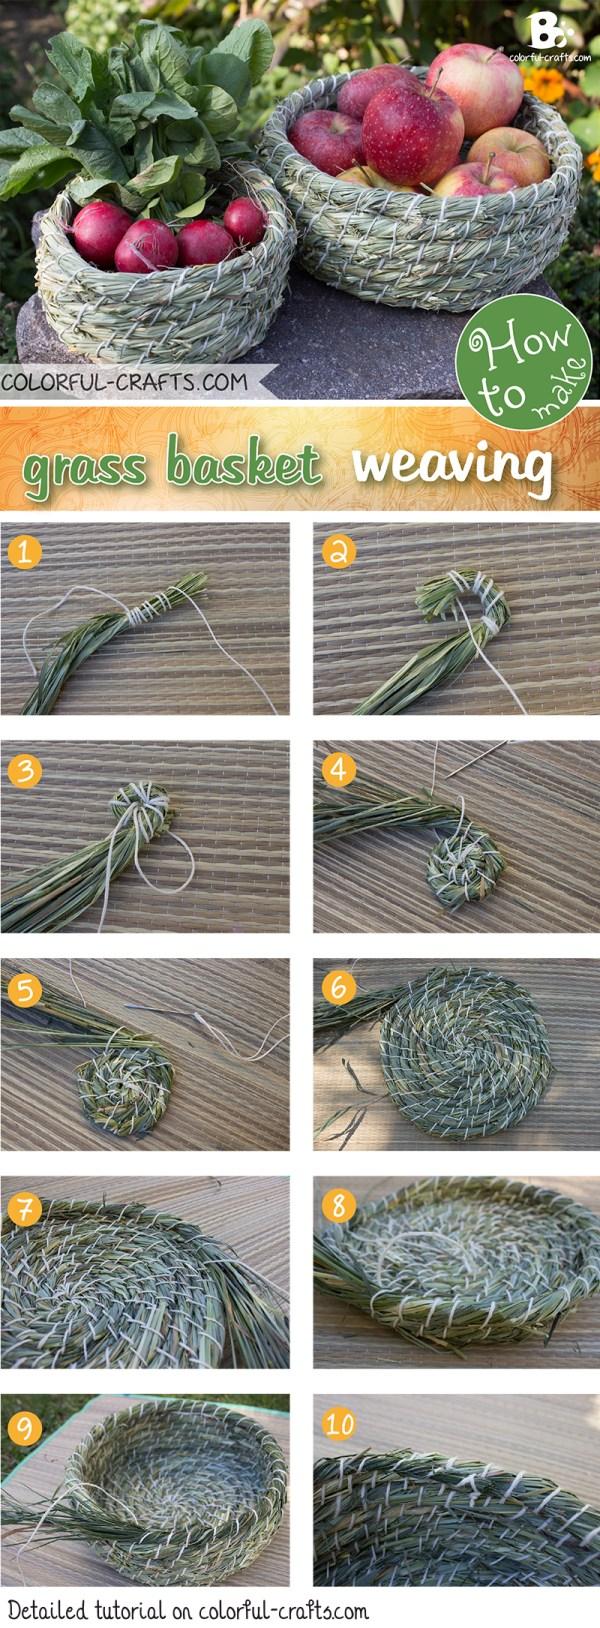 grass basket weaving tutorial // colorful-crafts.com